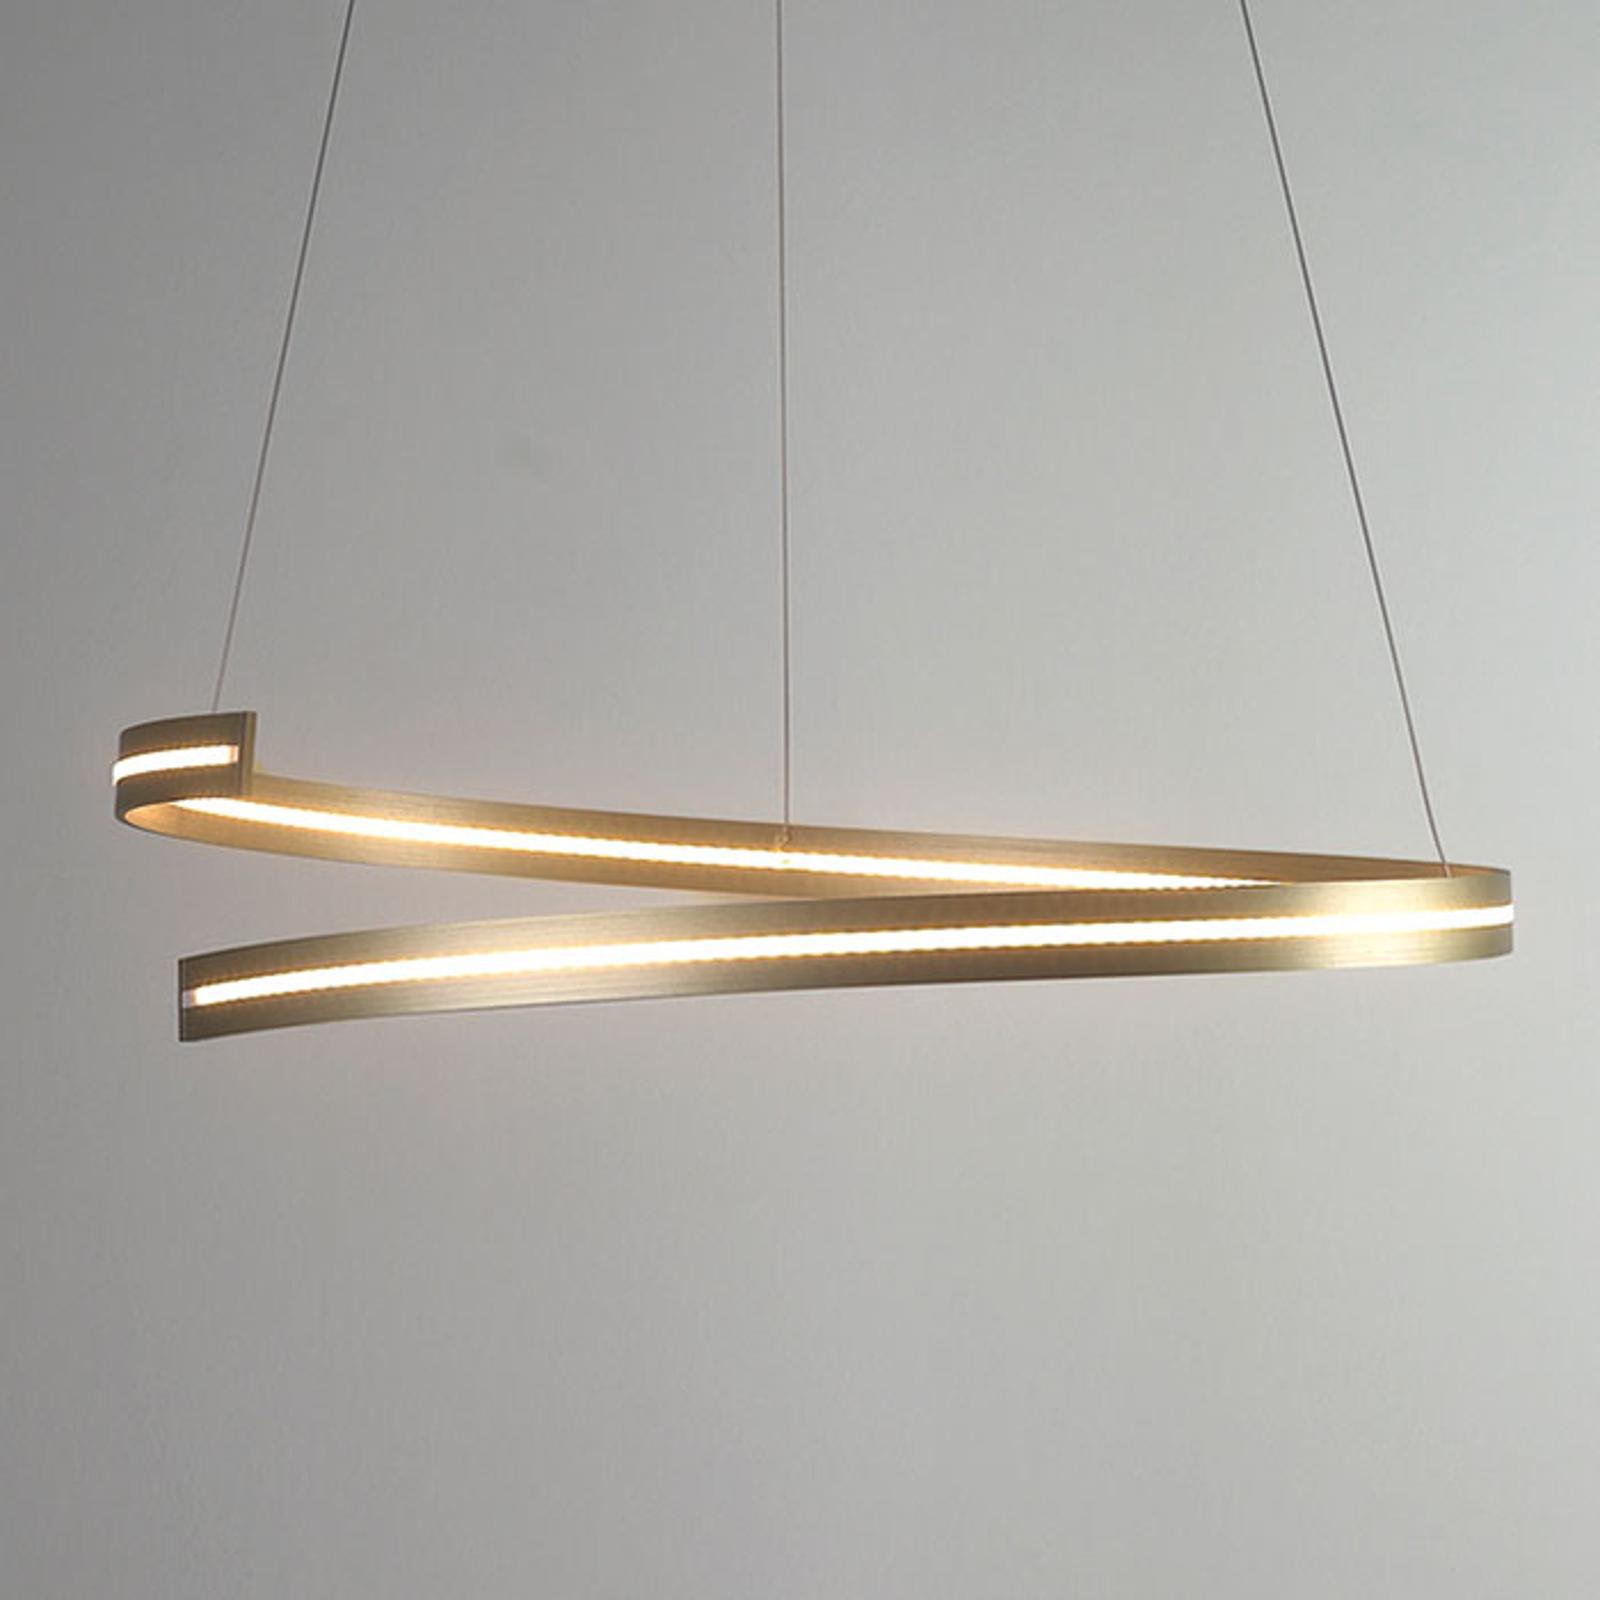 Bopp Break LED-hængelampe, 70 cm, lys guld